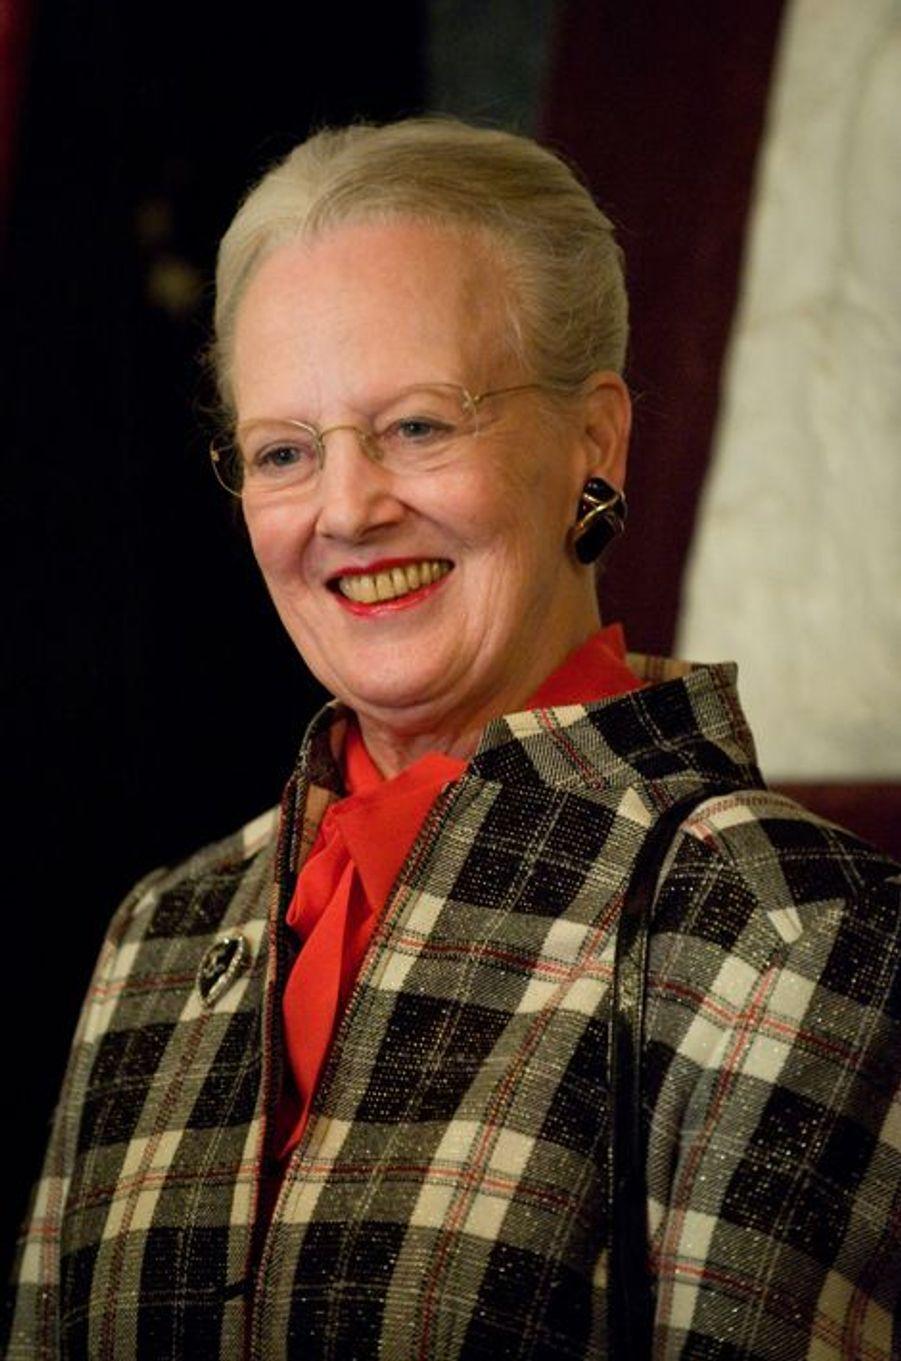 La reine Margrethe II de Danemark, le 1er novembre 2010